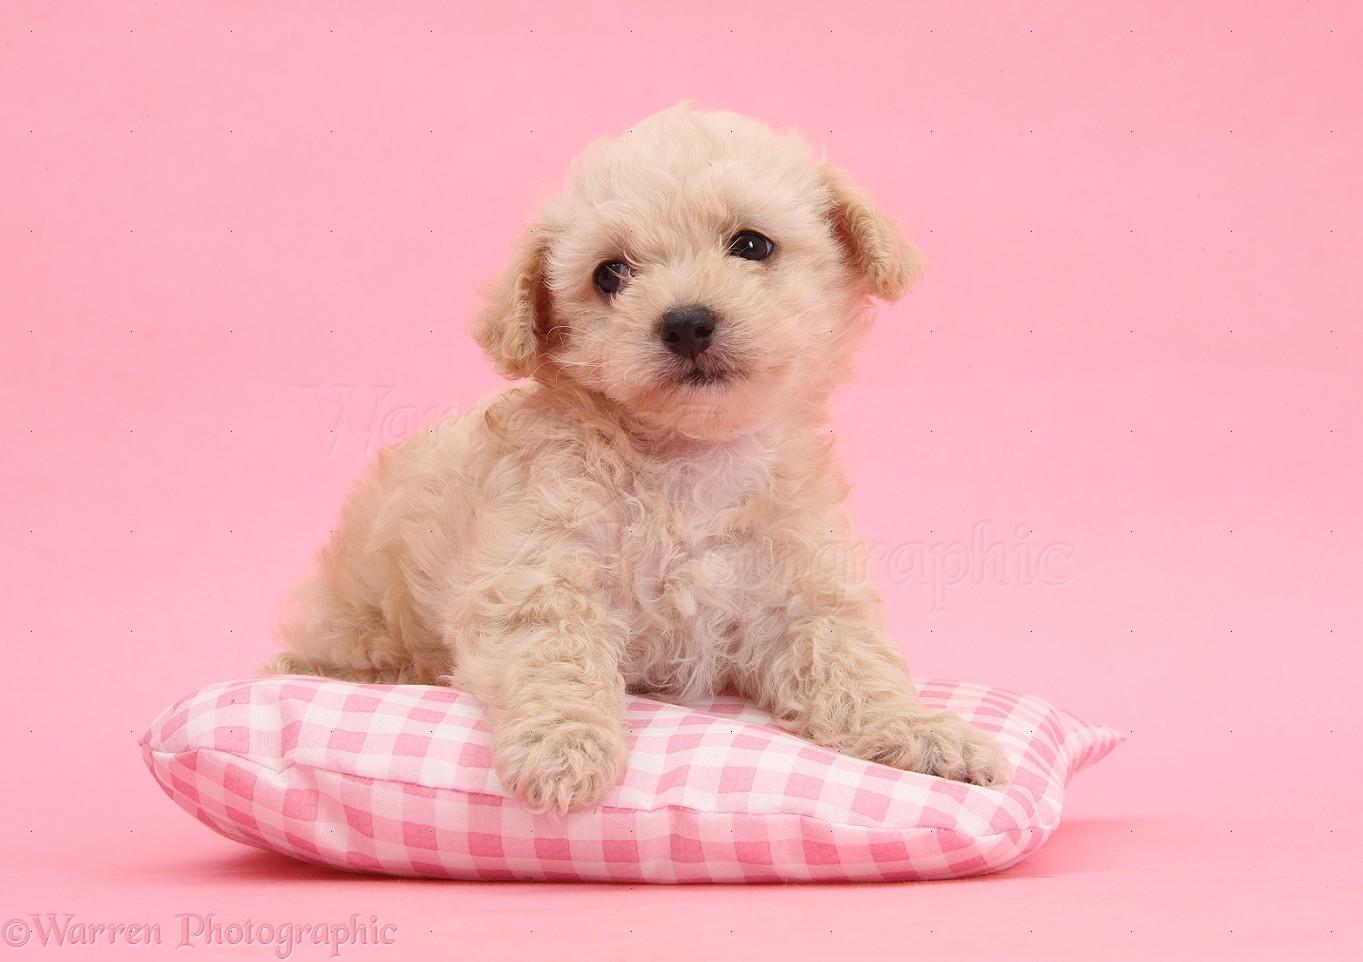 Dog Cute Bichon X Yorkie Pup On Pink Background Photo Wp35558